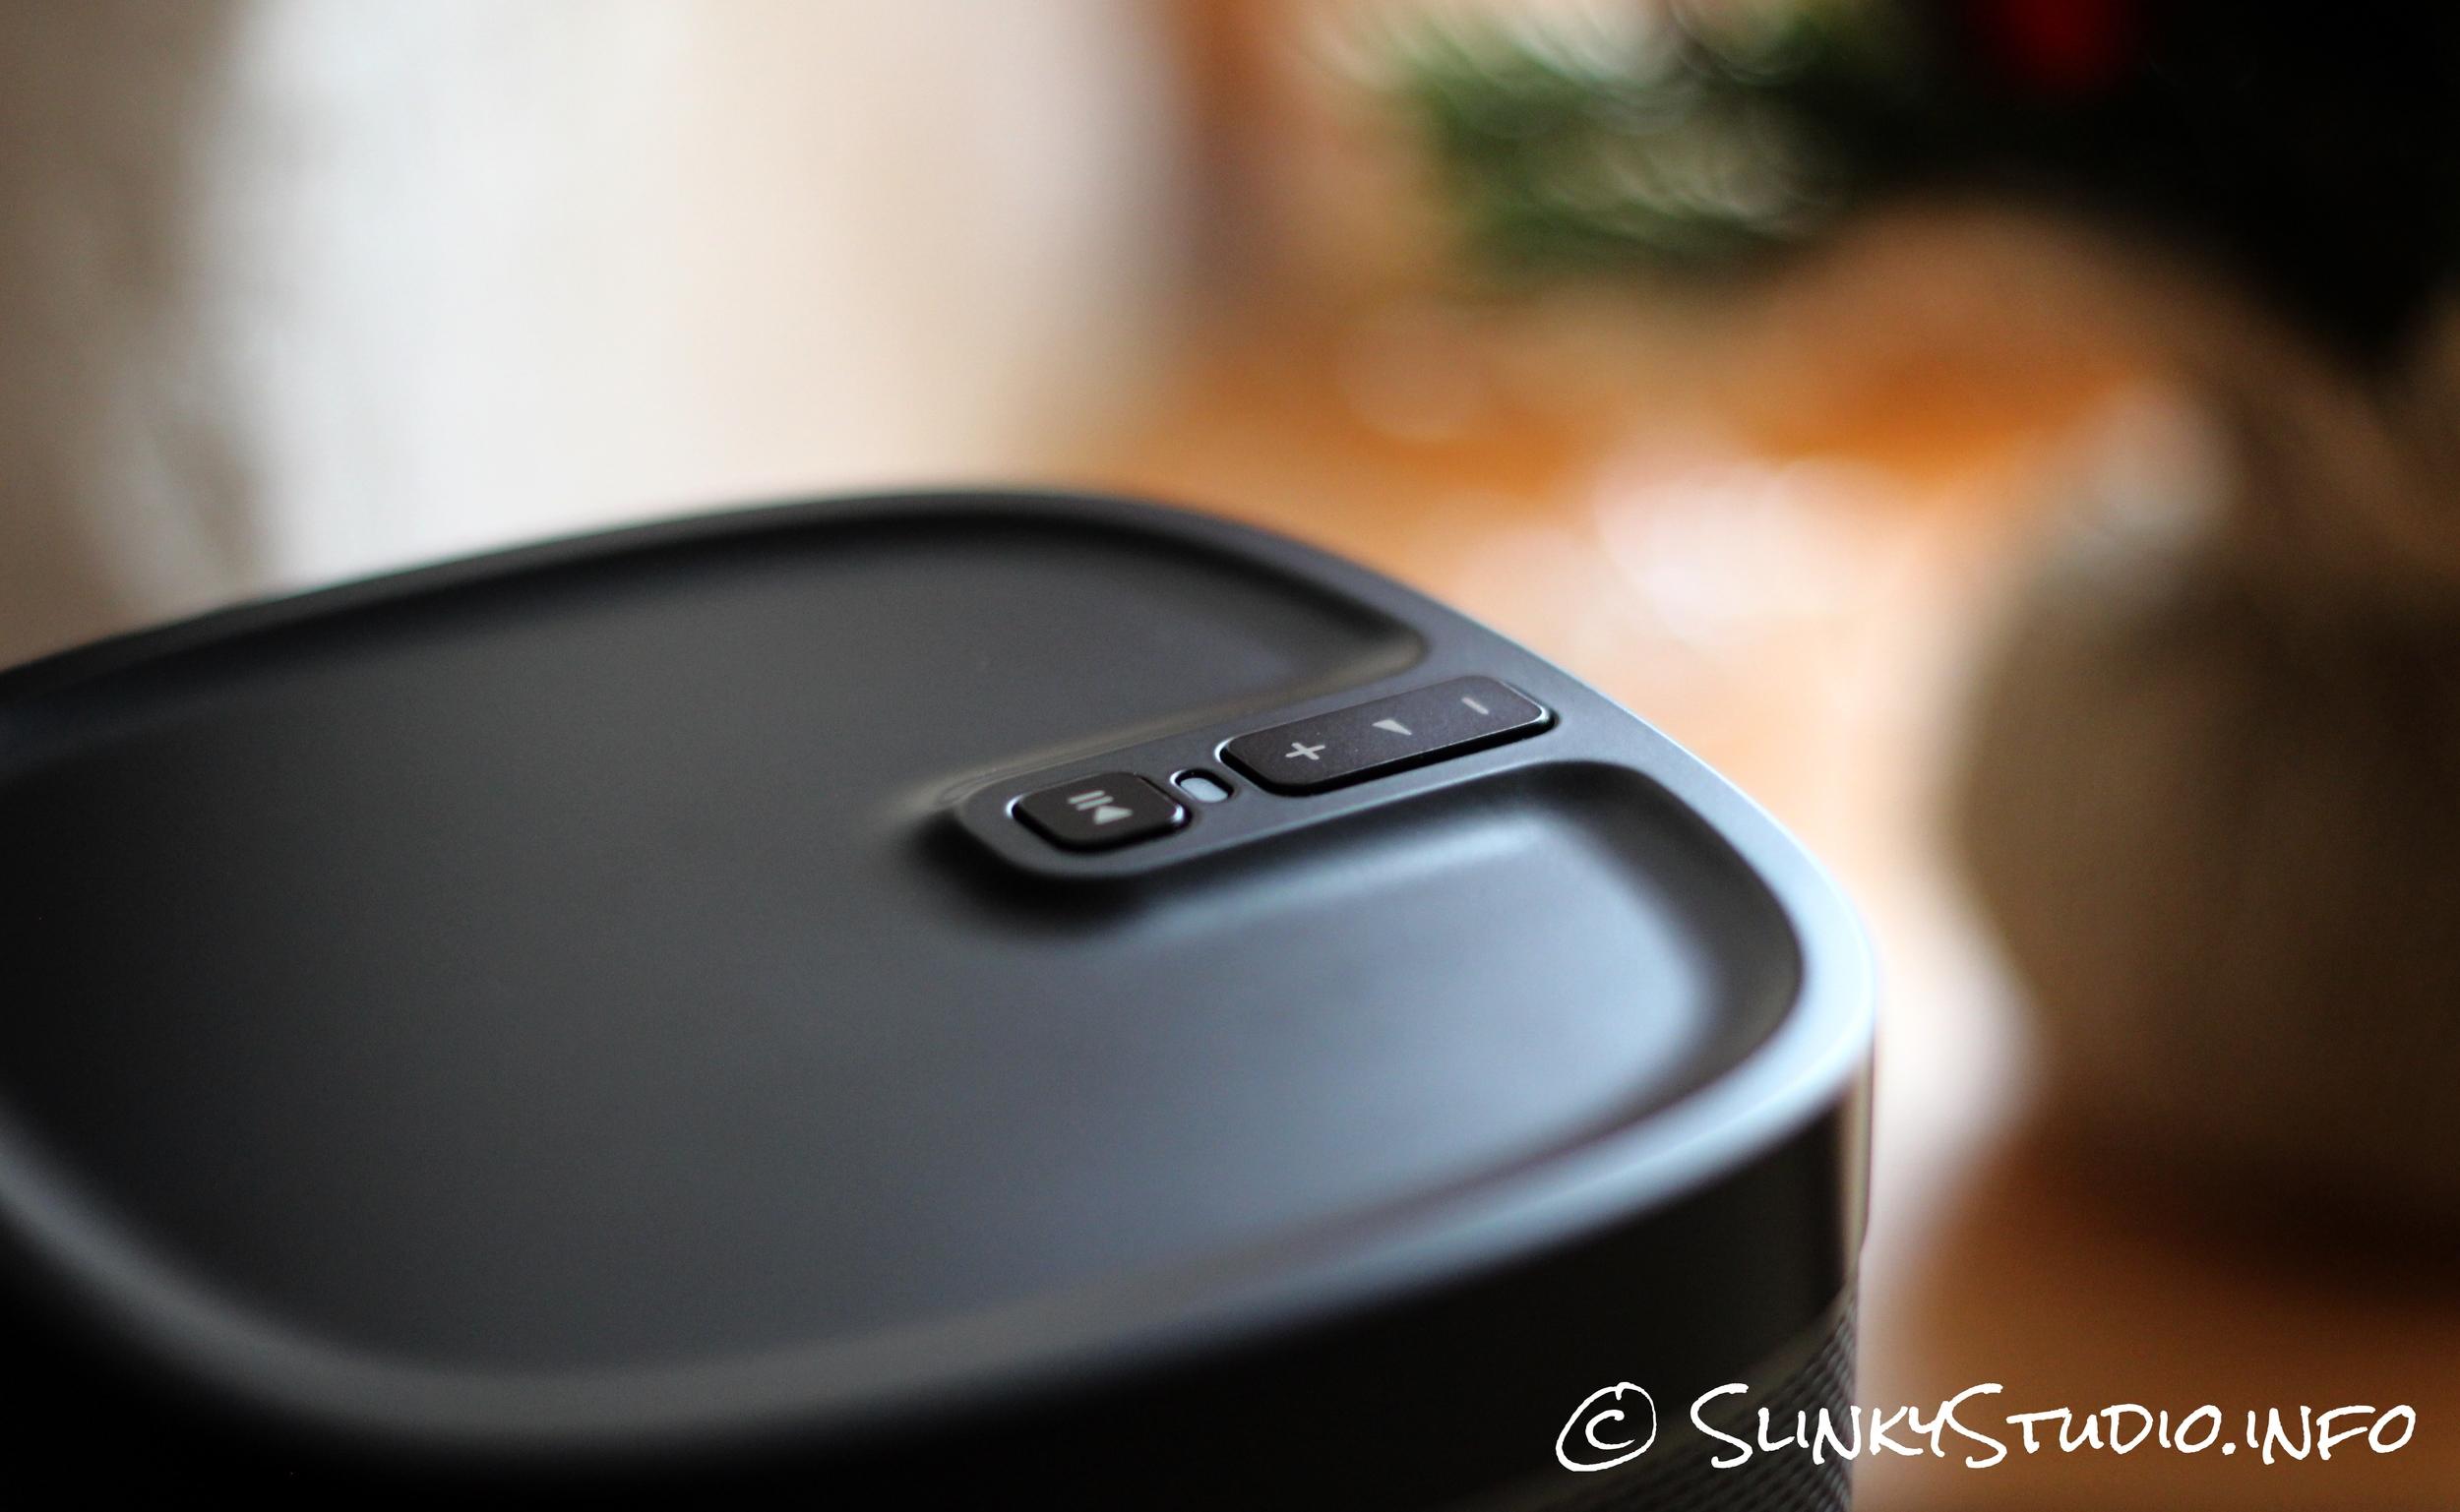 Sonos Play 1 Speaker Controls.jpg